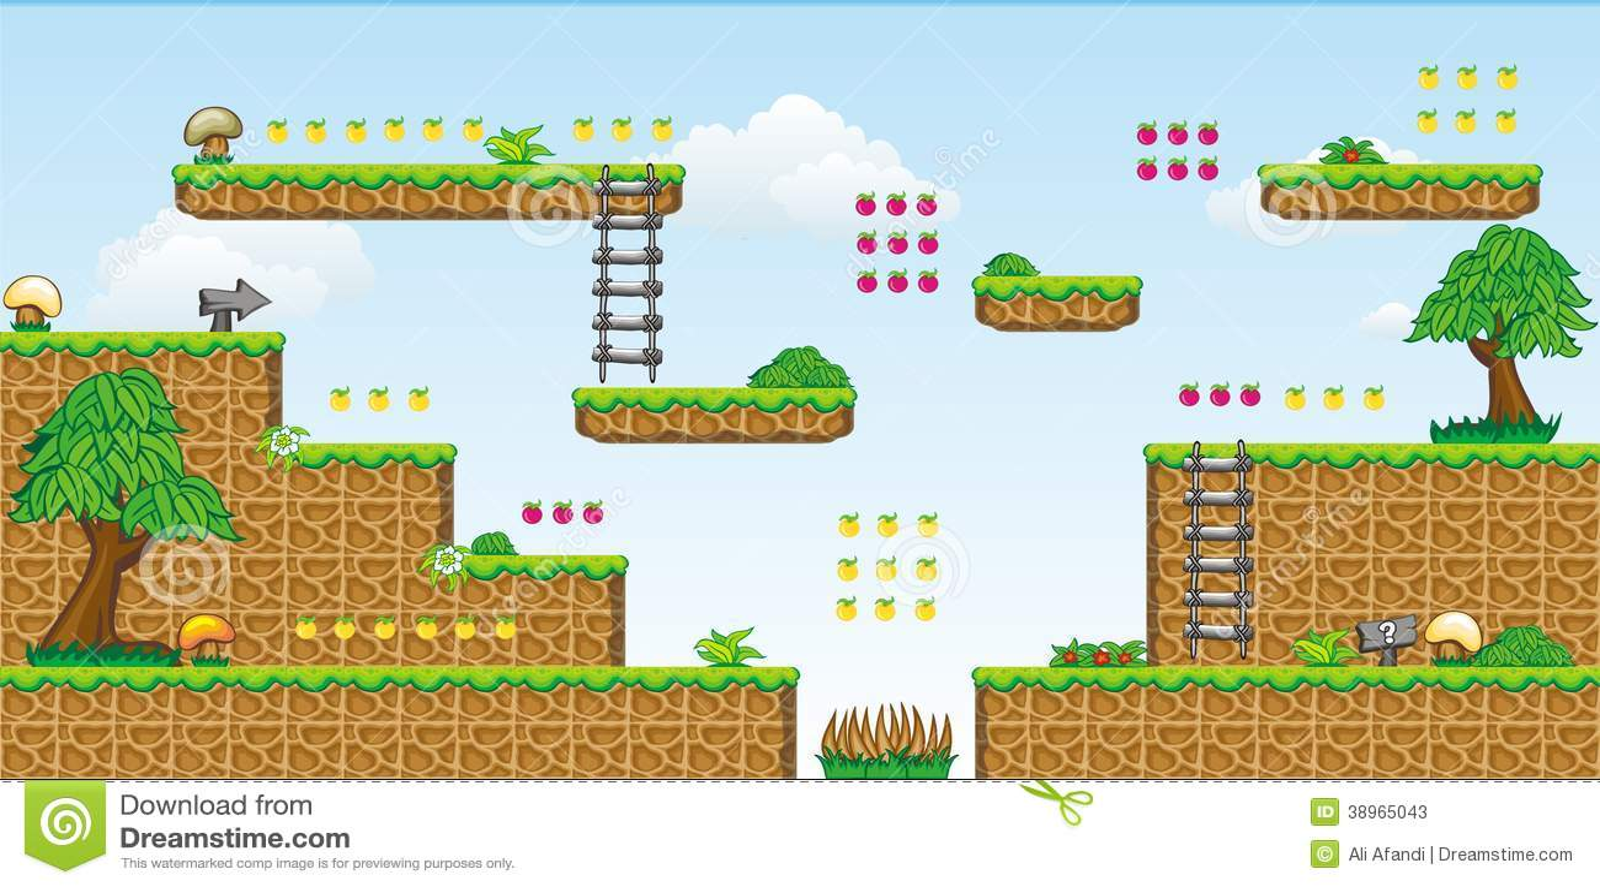 2D Tileset Platform Game 30 Stock Vector - Illustration of